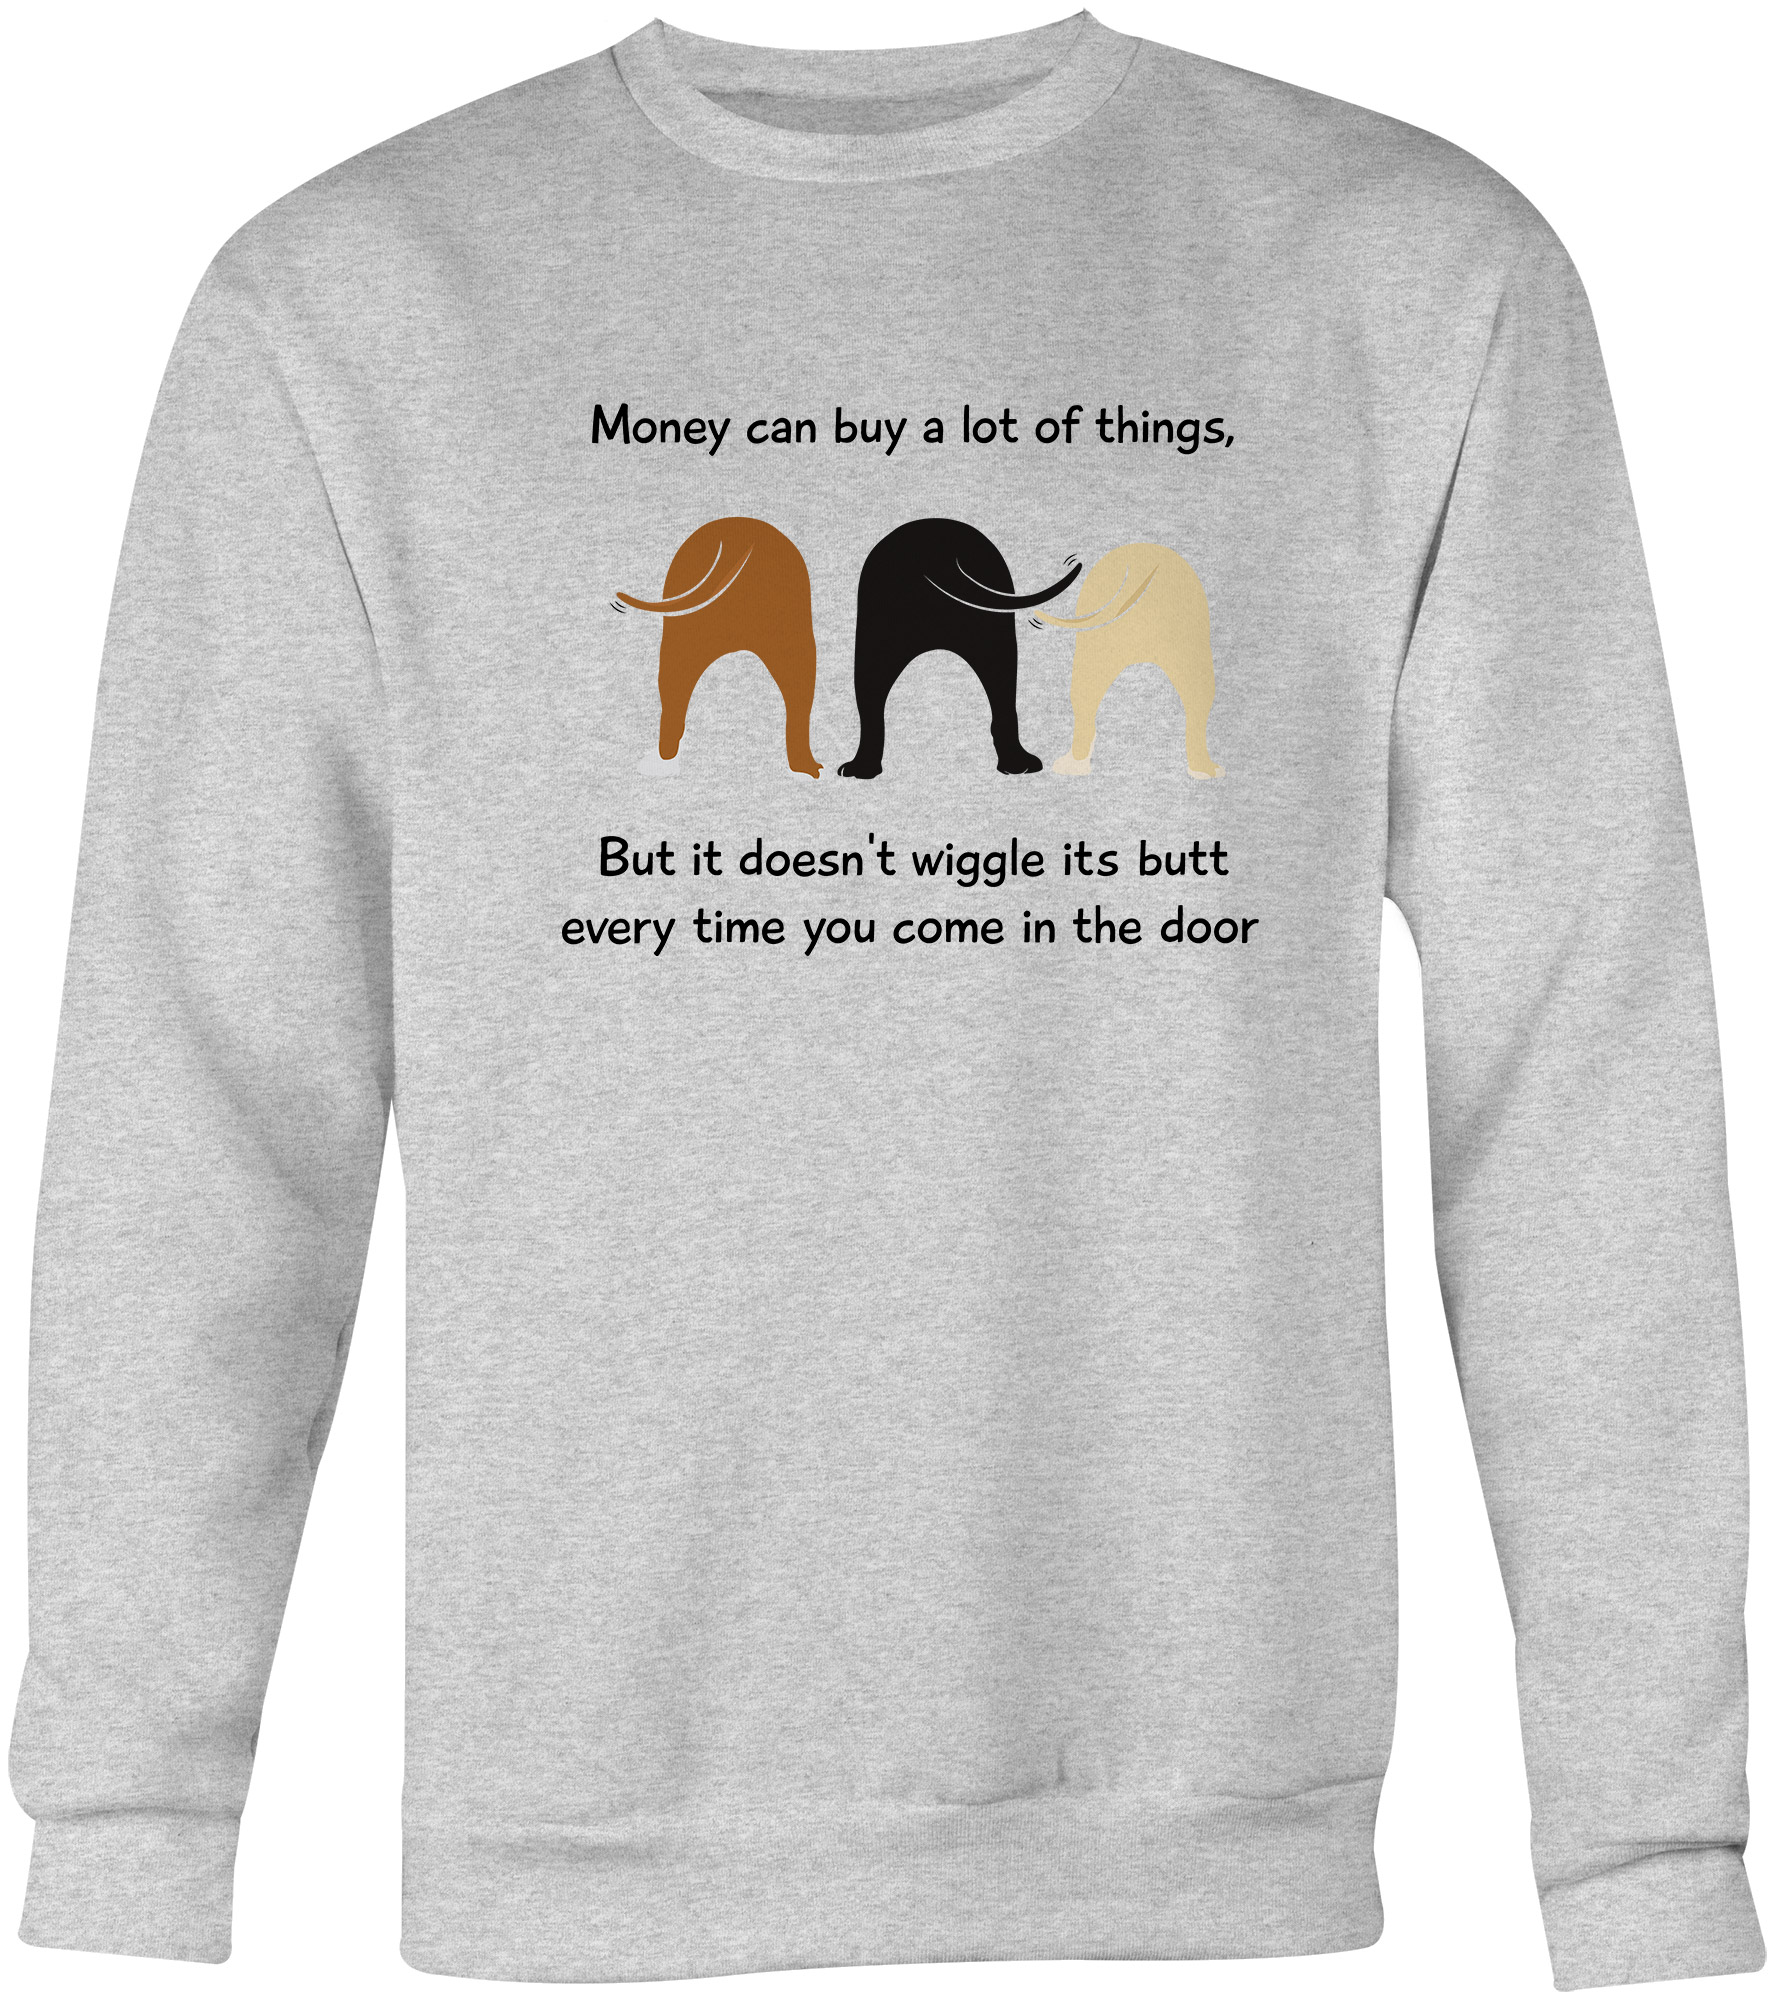 Wiggle Butt Crew Neck Sweatshirt – iHeartDogs.com